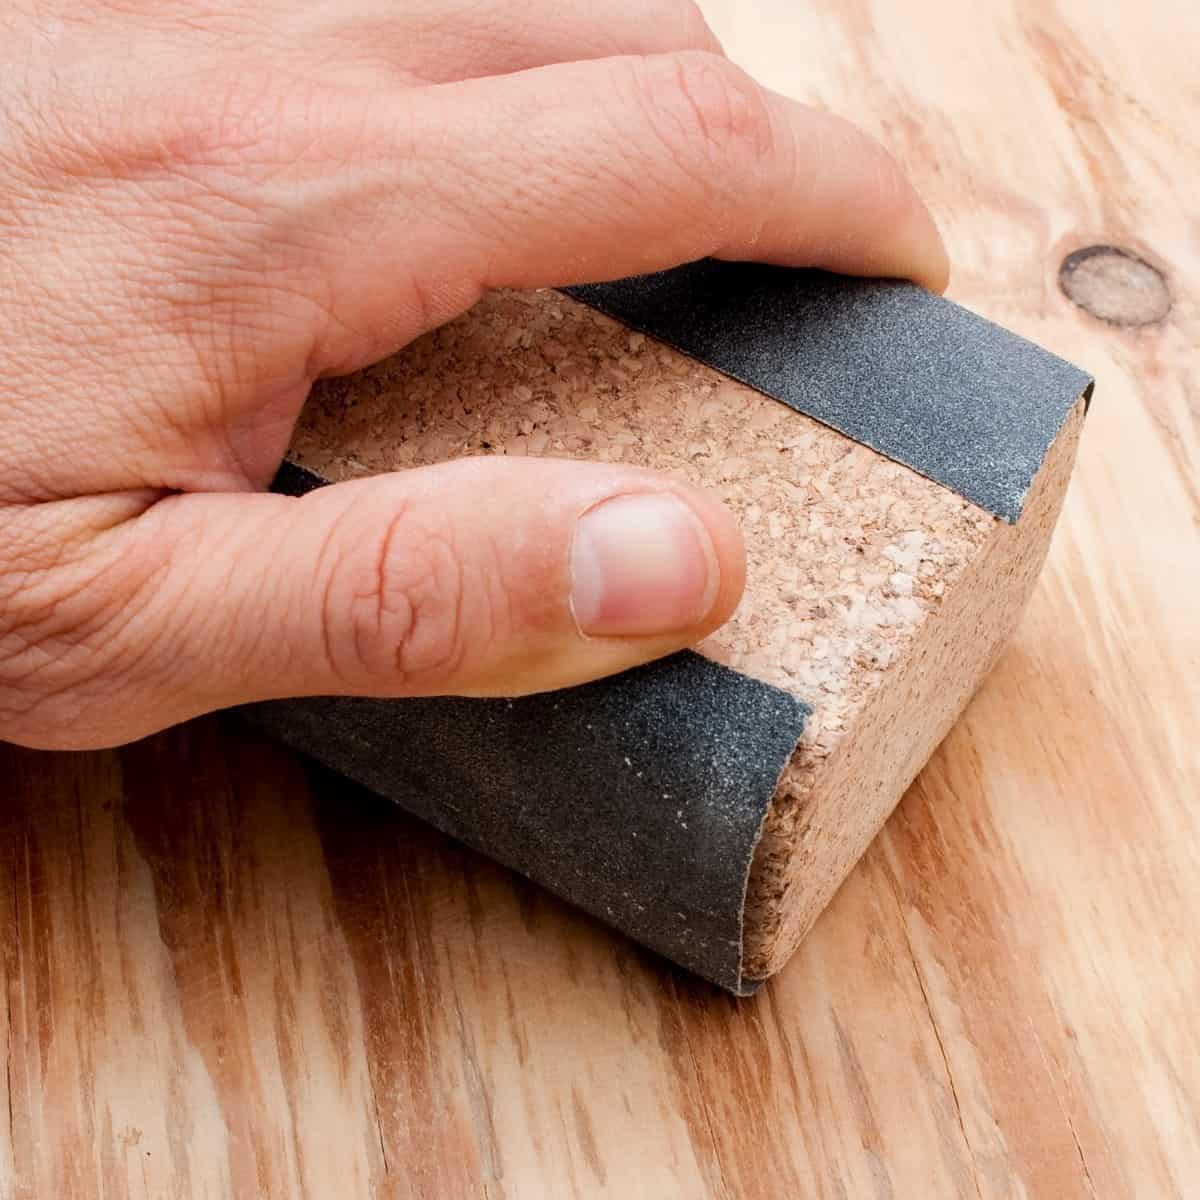 hand wrapped around sanding block